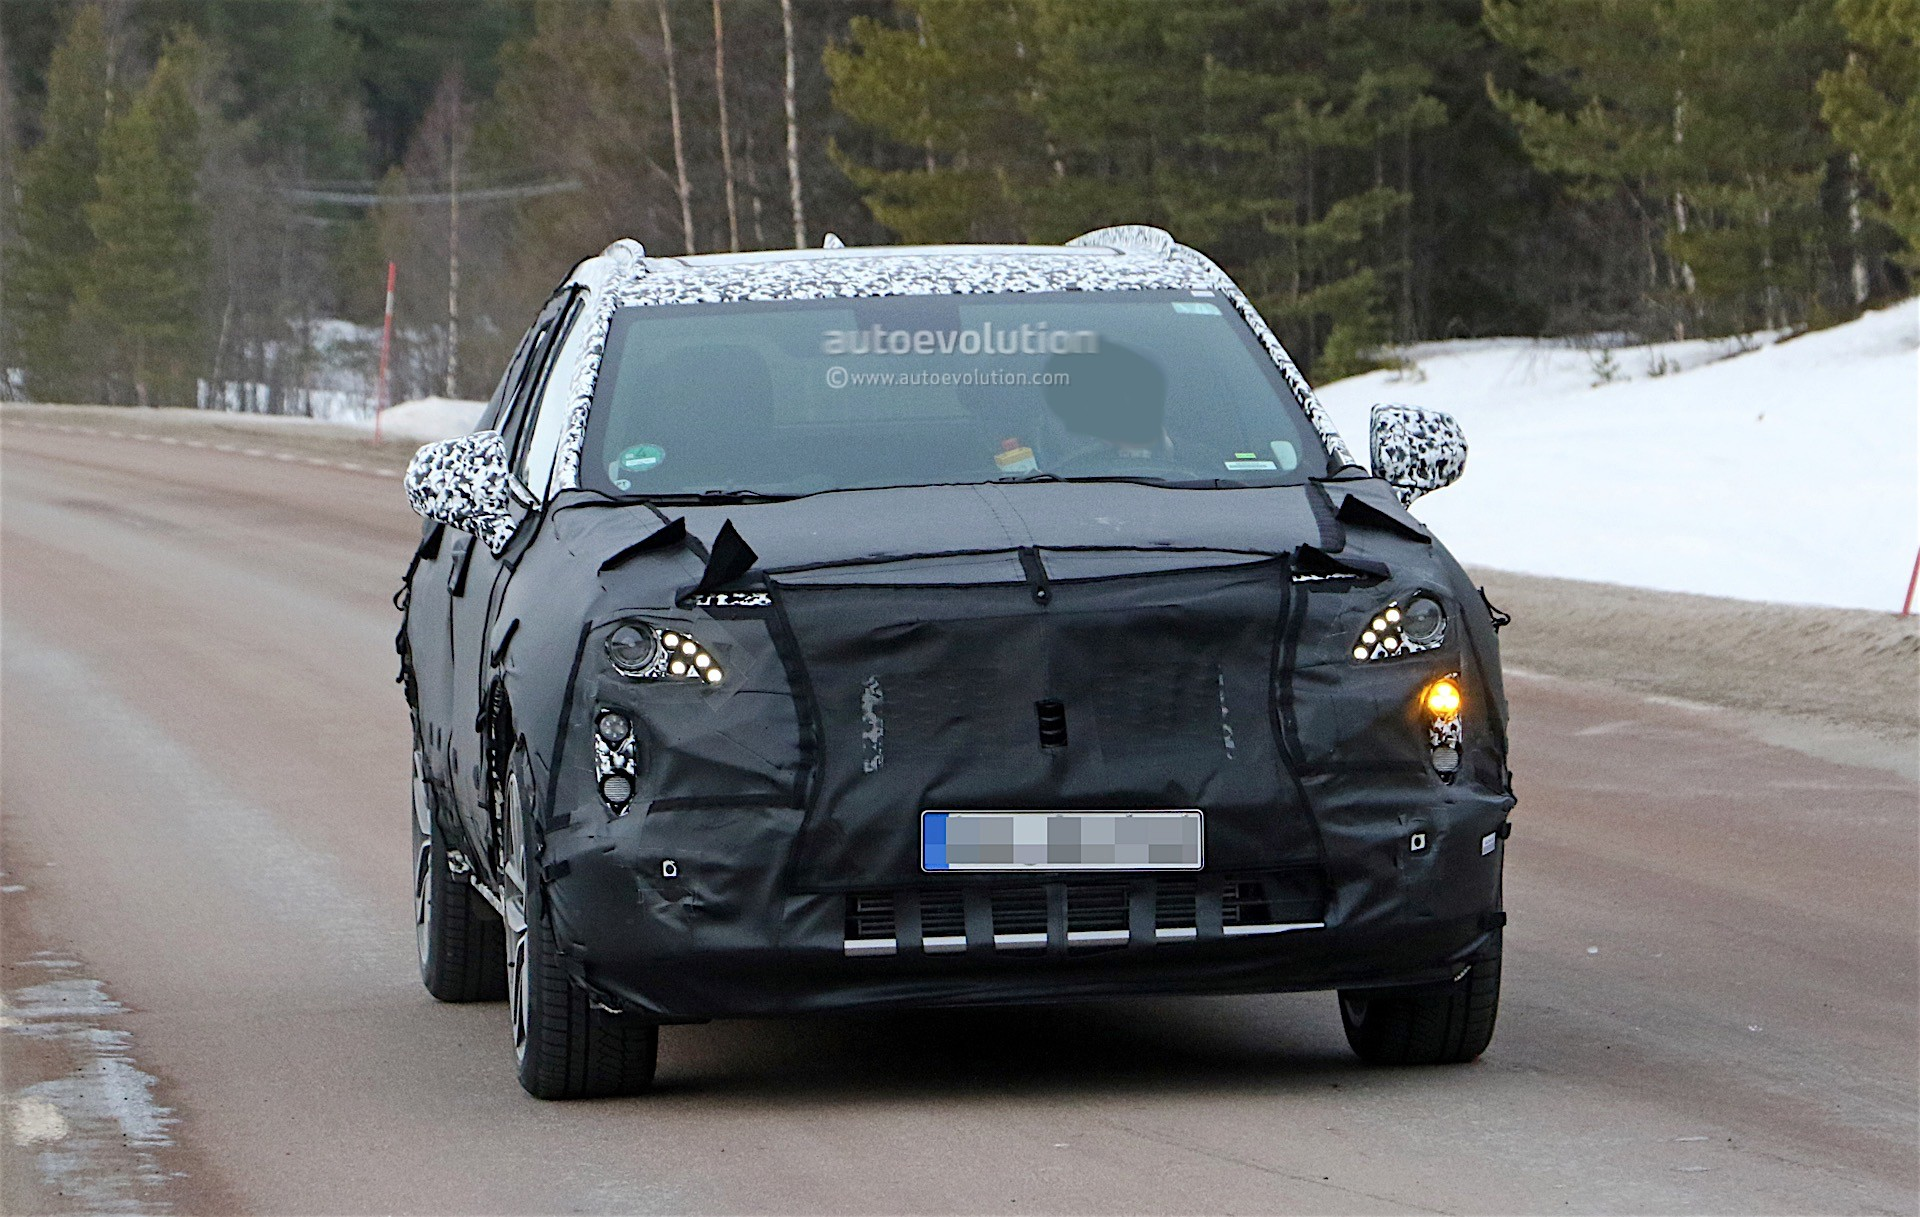 2018 cadillac xt3. Brilliant Cadillac Cadillac XT3 Prototype  For 2018 Cadillac Xt3